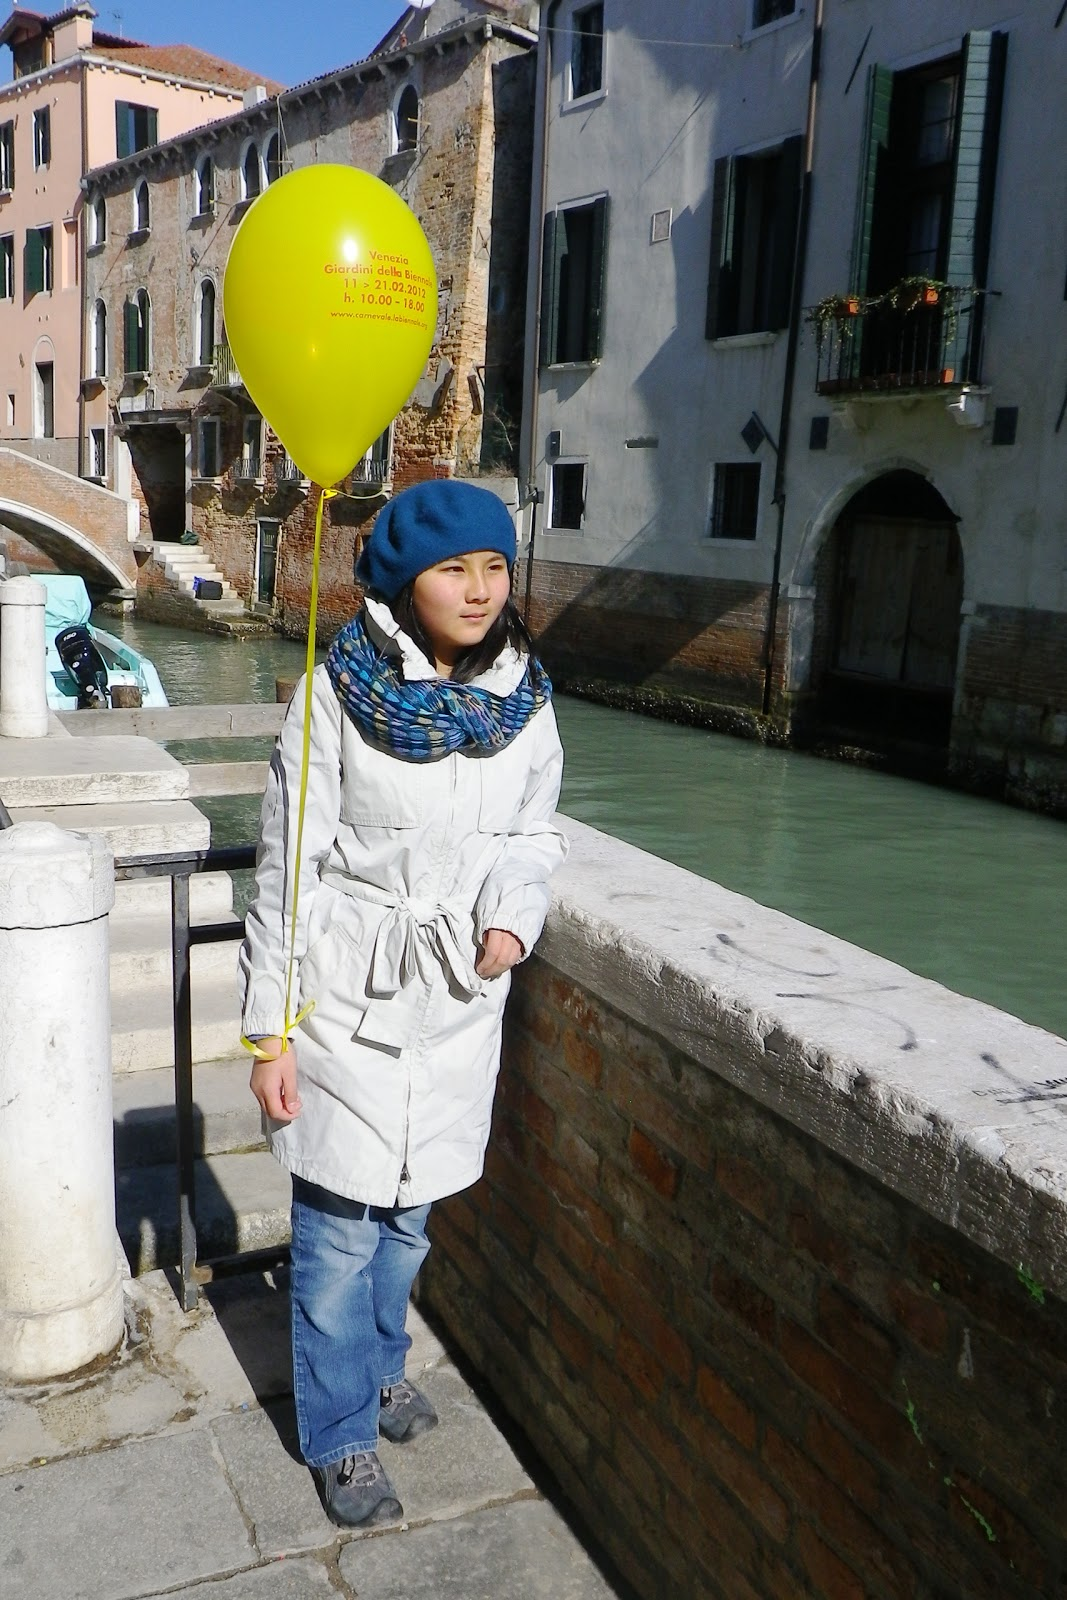 http://2.bp.blogspot.com/-oFZKVwn5_7U/T0o6JYFZRxI/AAAAAAAACnY/GNWFjIxvSuM/s1600/venice+karo+w+yellow+balloon.JPG